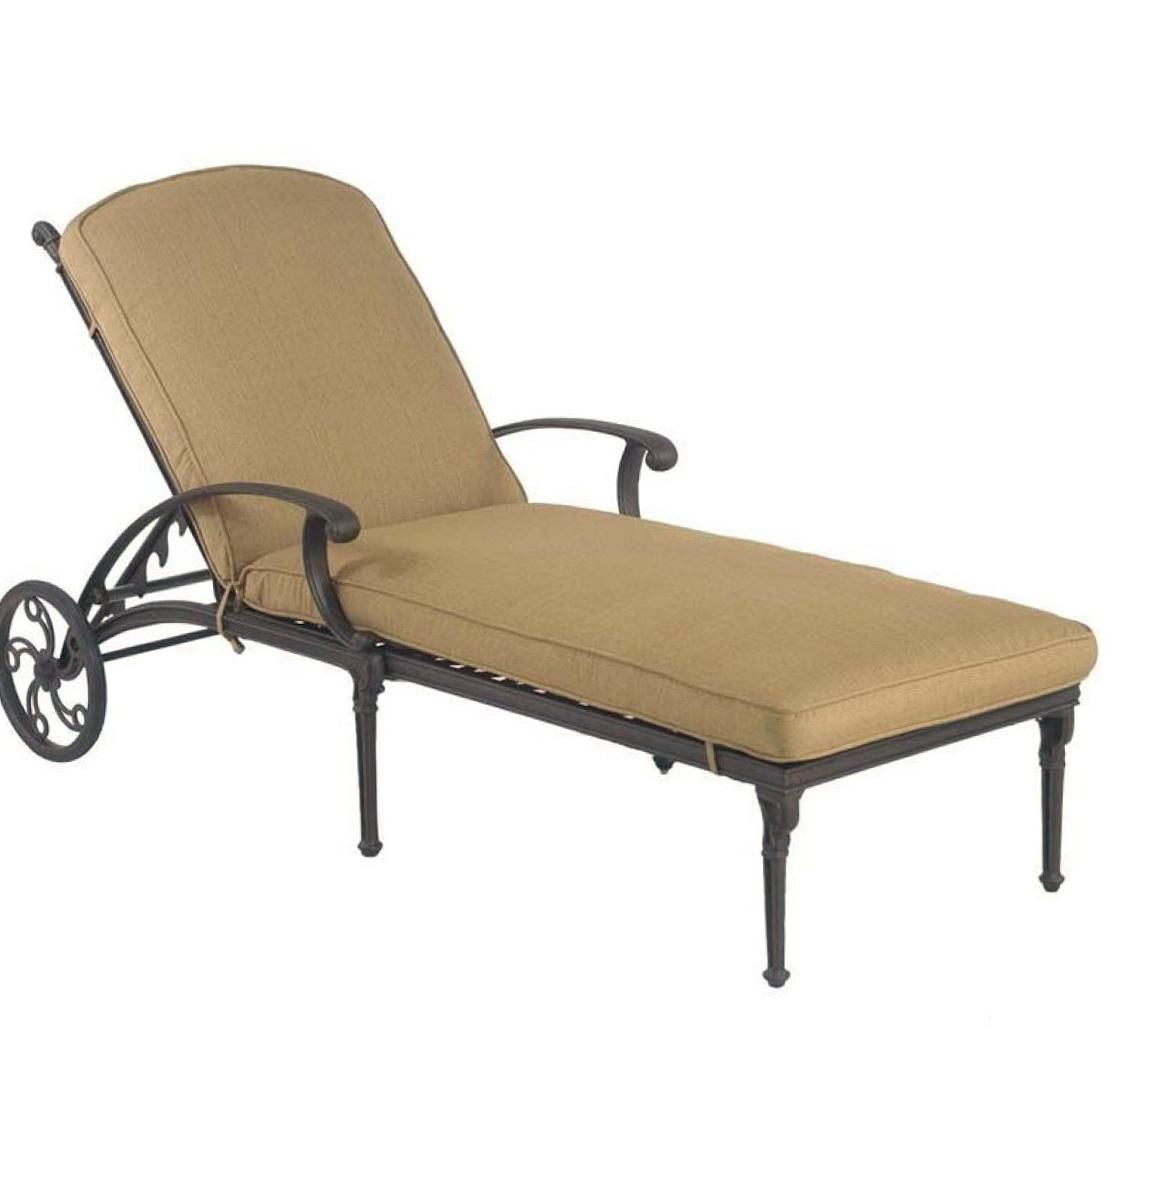 Outdoor Furniture Covers Walmart Canada